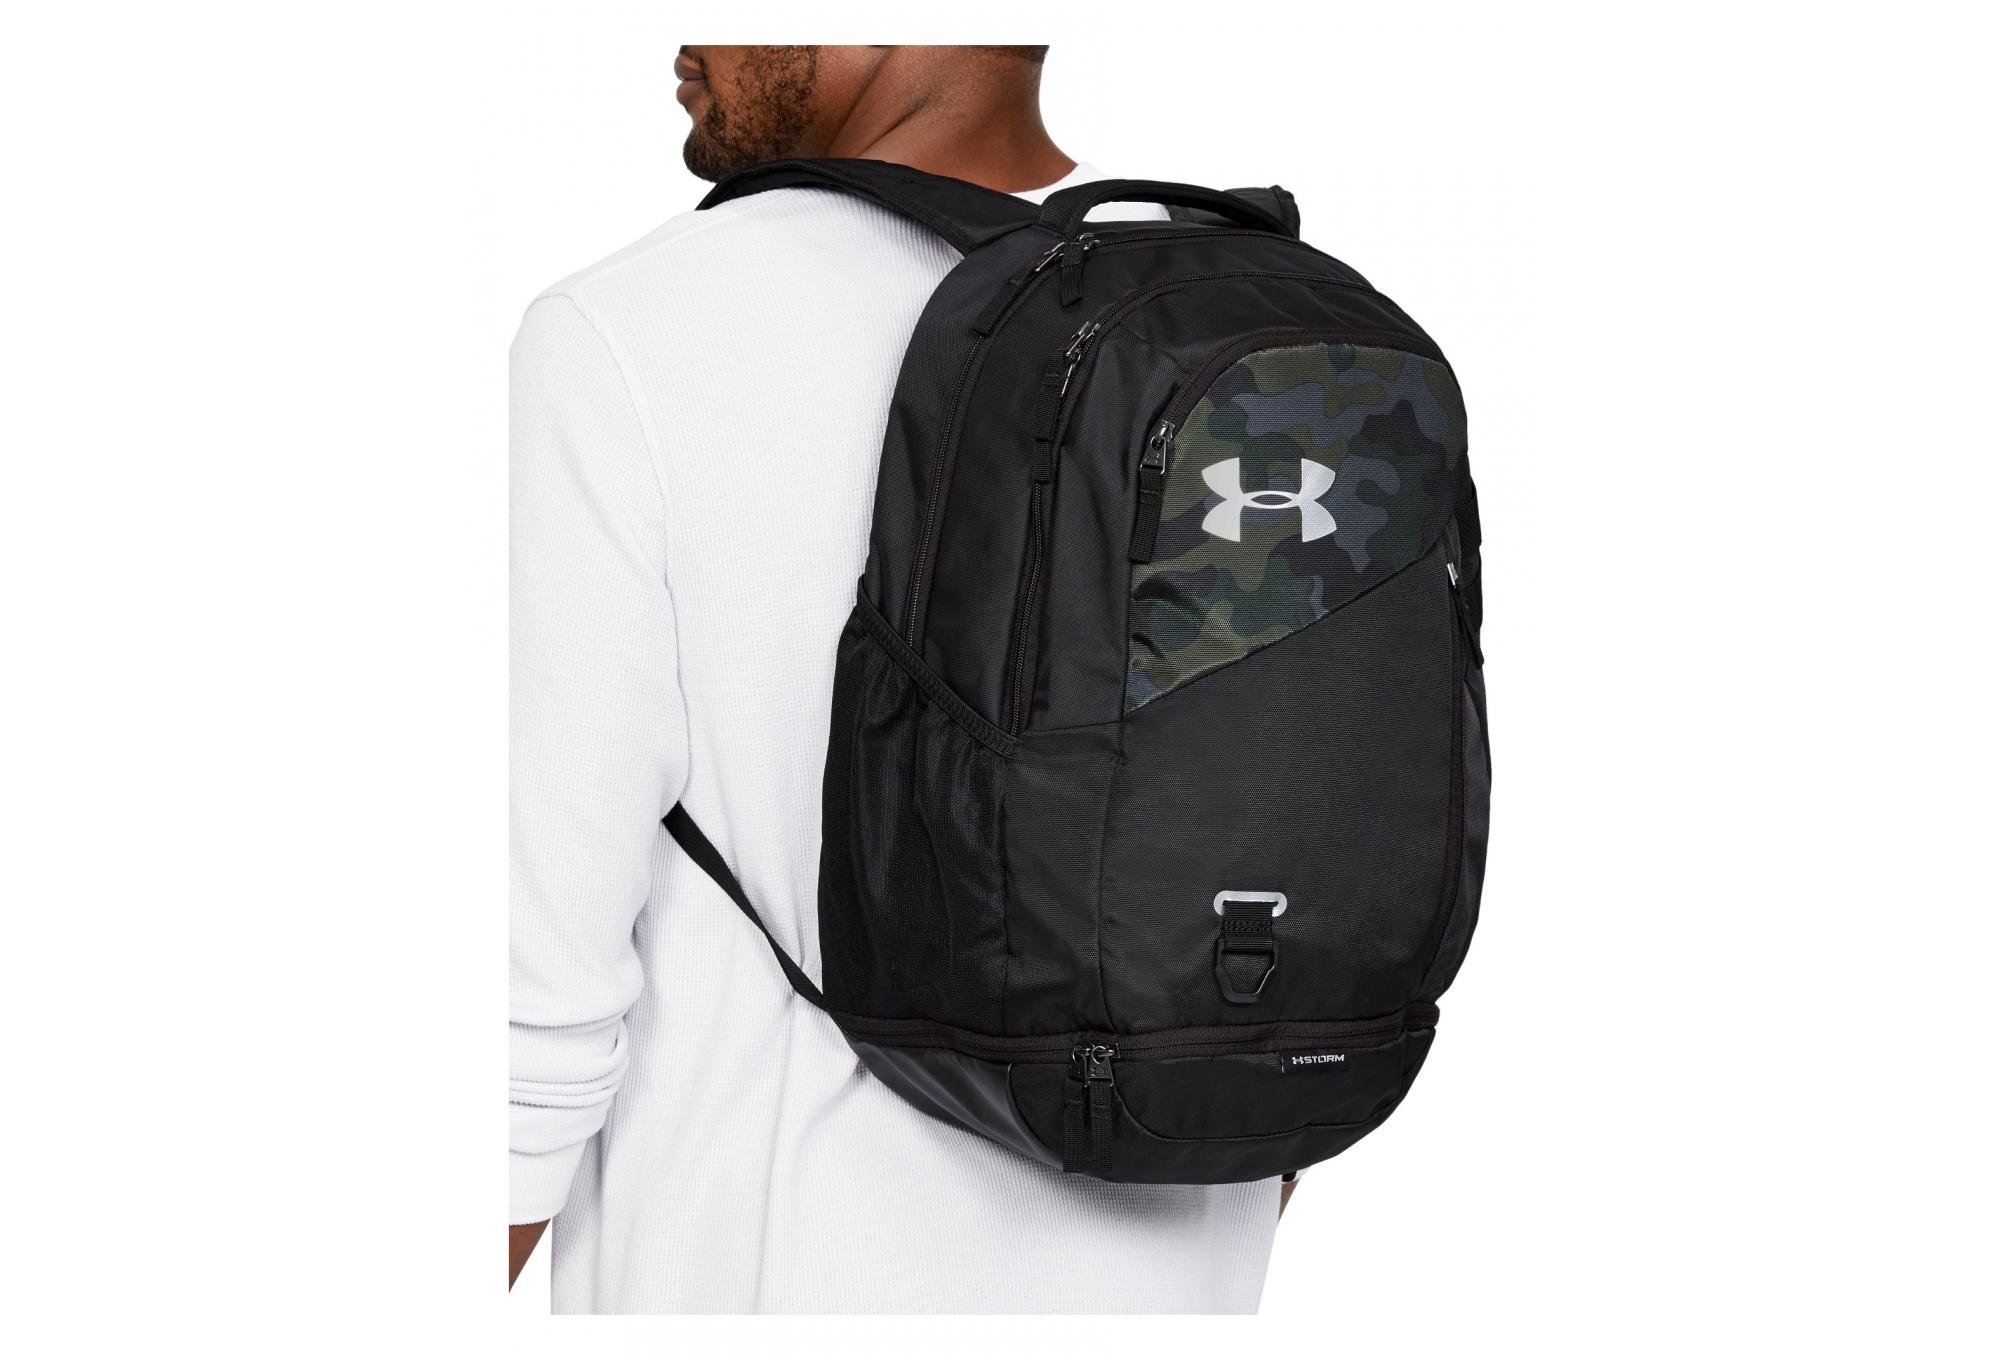 tomar odio mantequilla  Under Armour Hustle 4.0 Backpack Black Camo | Alltricks.com